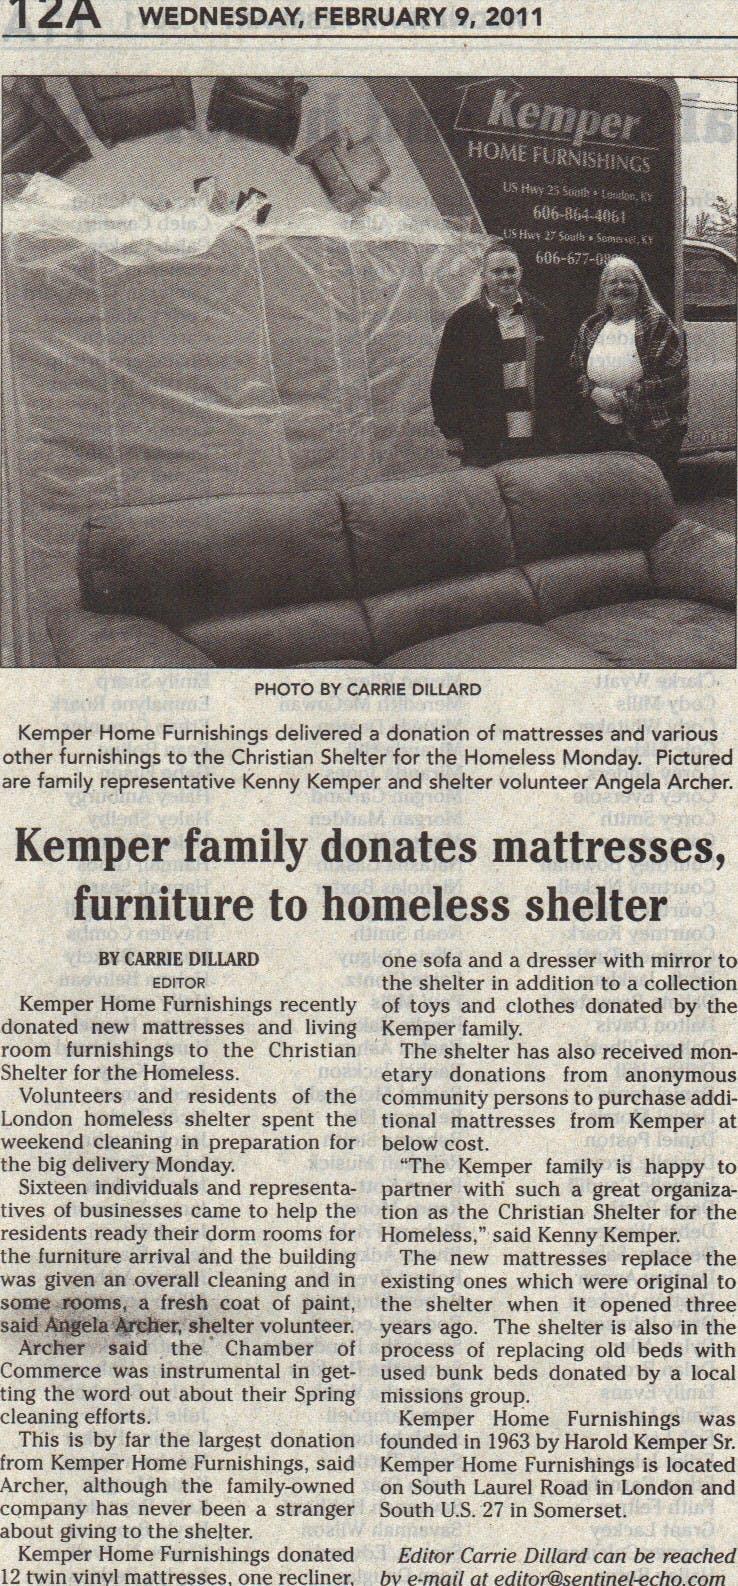 Kemper Home Furnishings